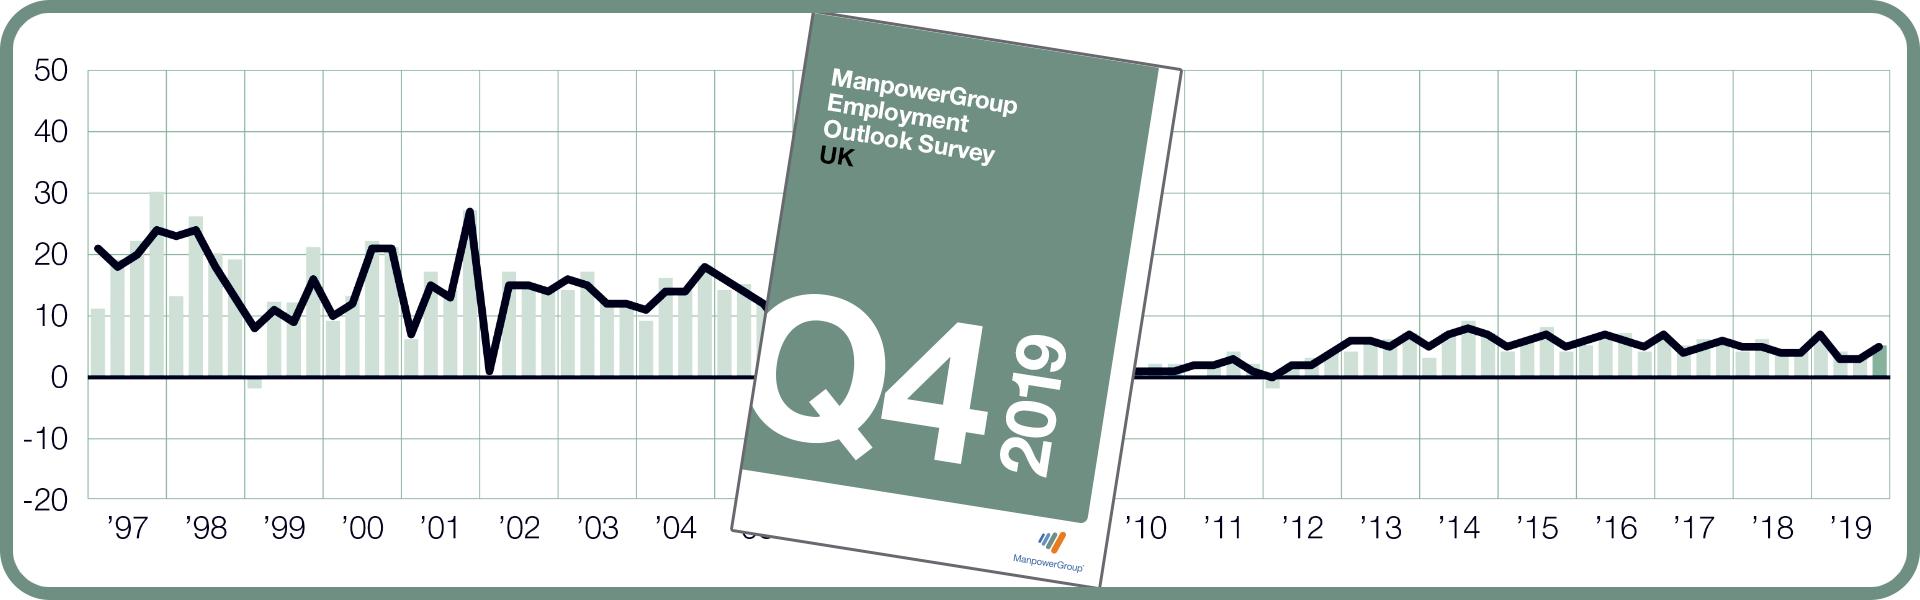 ManpowerGroup Employment Outlook Survey - Q4 2019